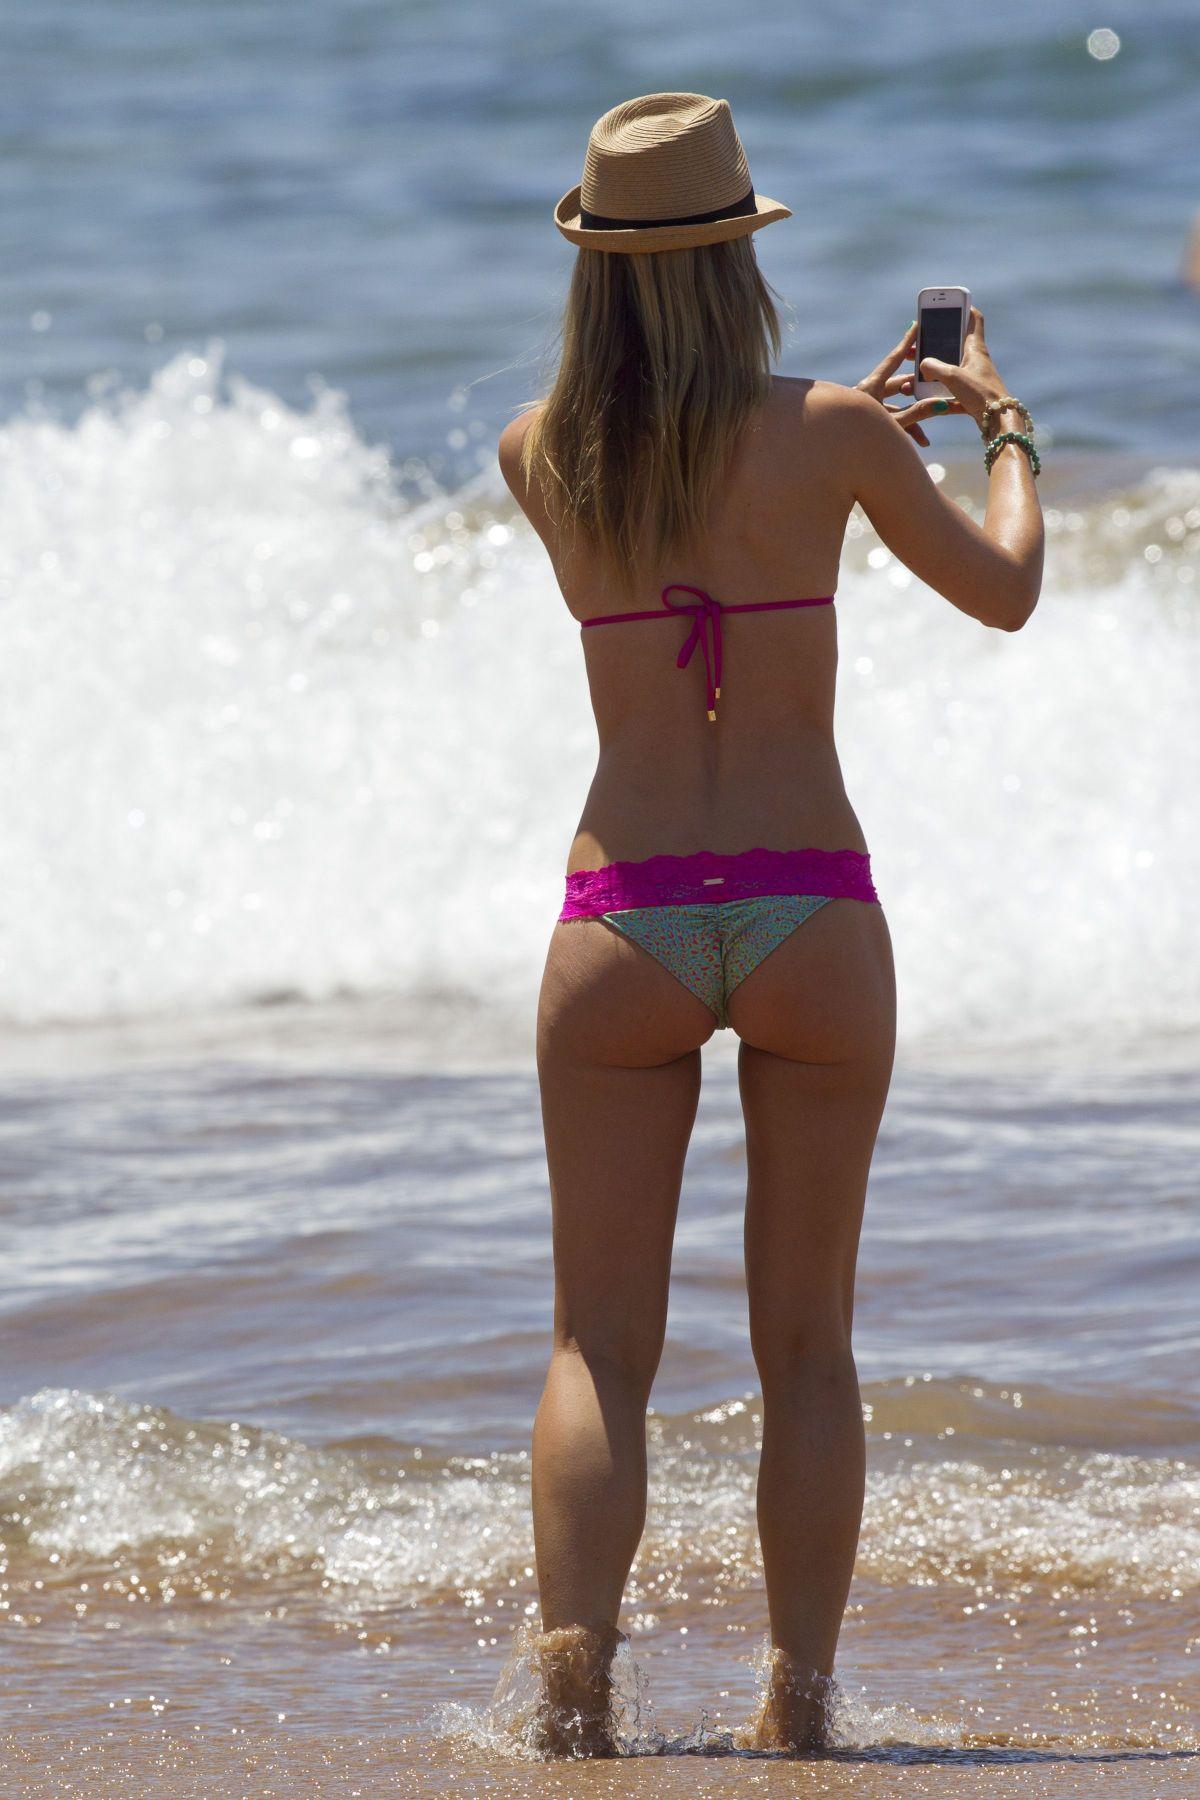 Pregnant ebony naked girls sucking breast